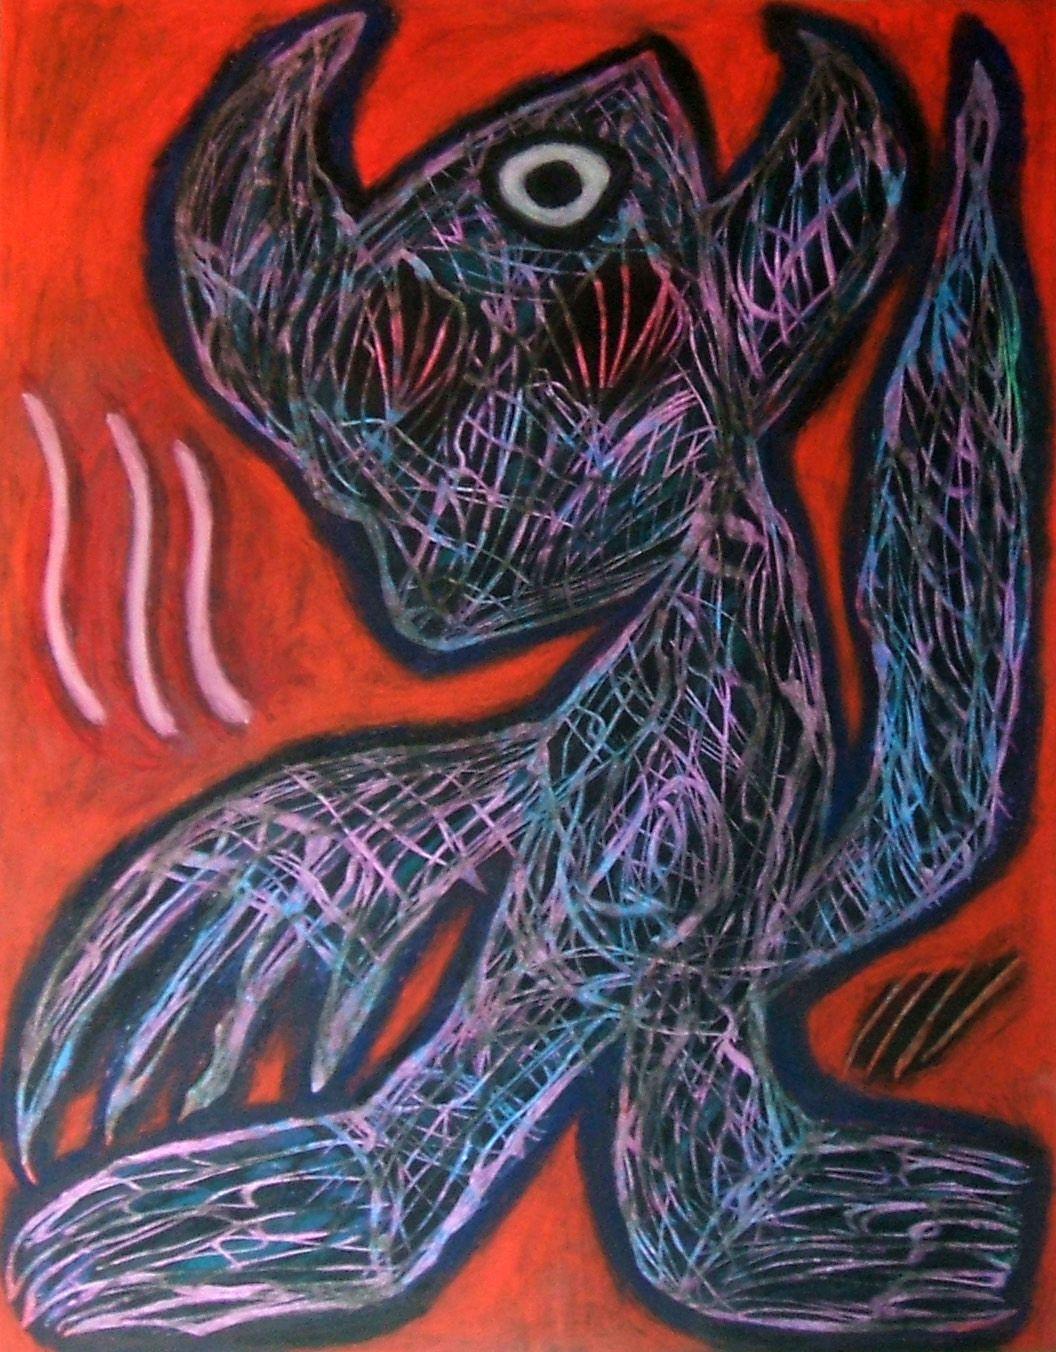 """Il fosco"" (Demone-felino-alieno) 2014 Tecnica mista su cartoncino 48x38 ©Pietro Gargano"